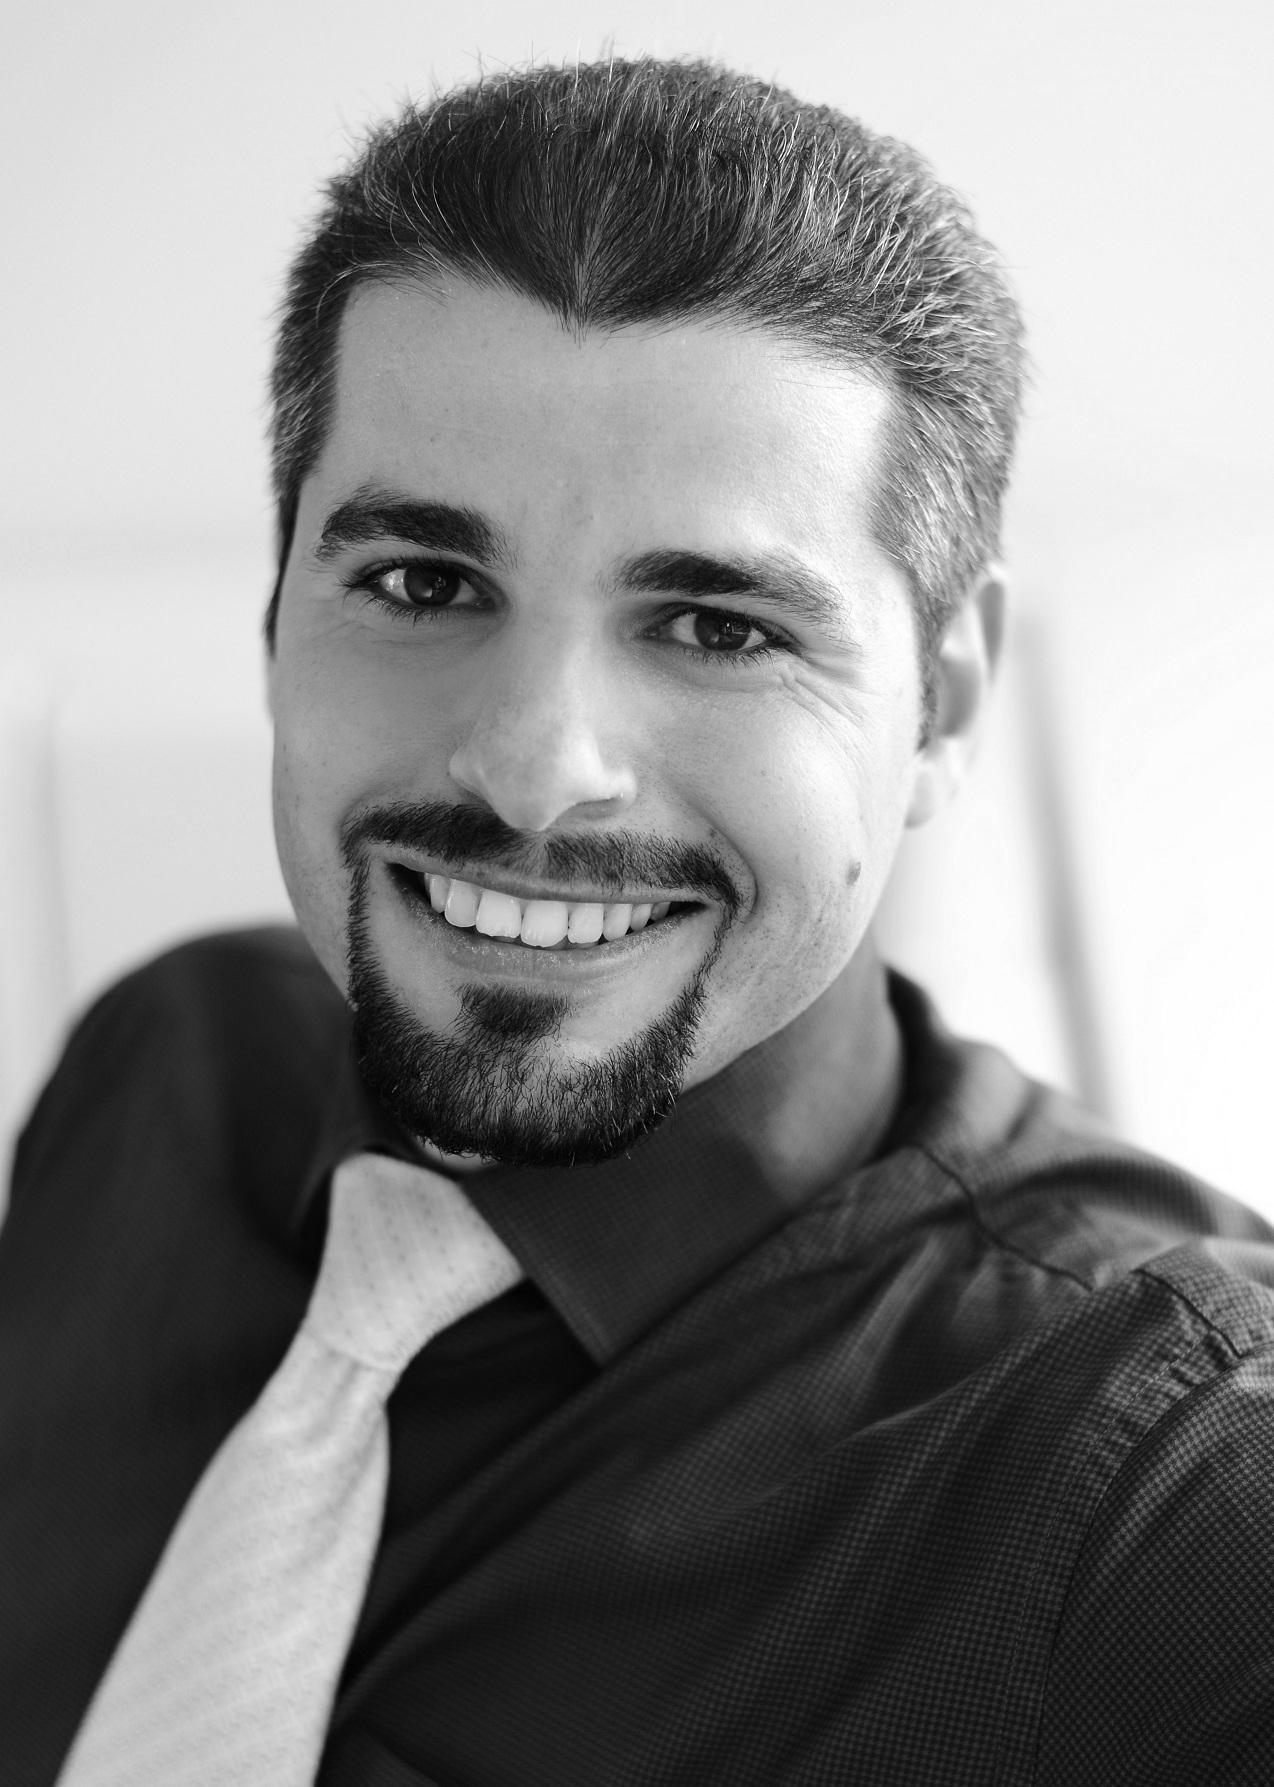 Rawad Zyadeh